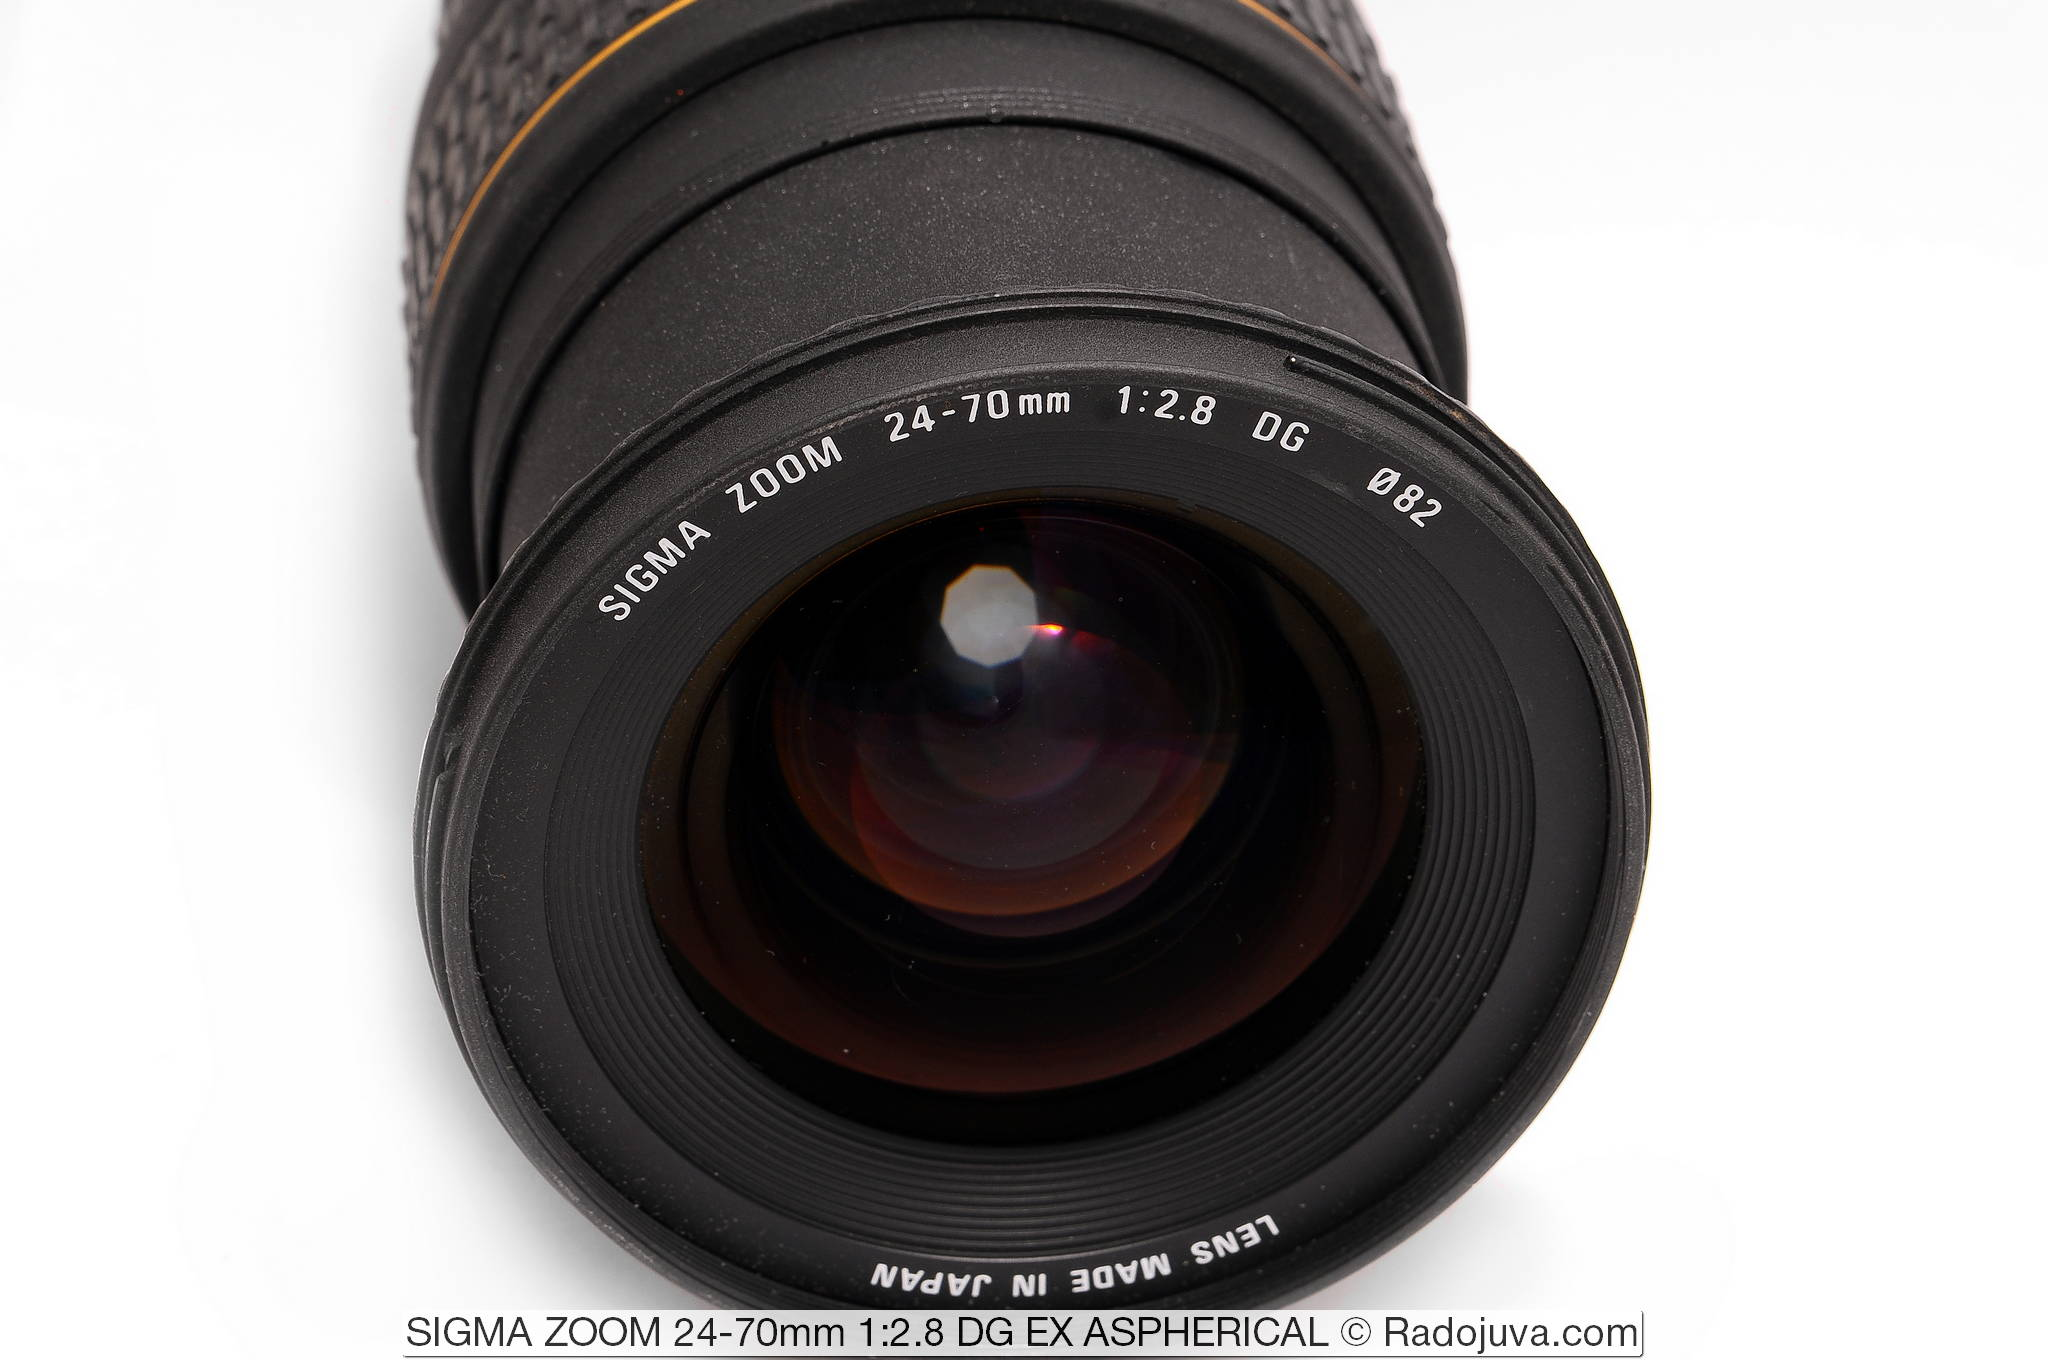 SIGMA ZOOM 24-70mm 1:2.8 DG EX ASPHERICAL